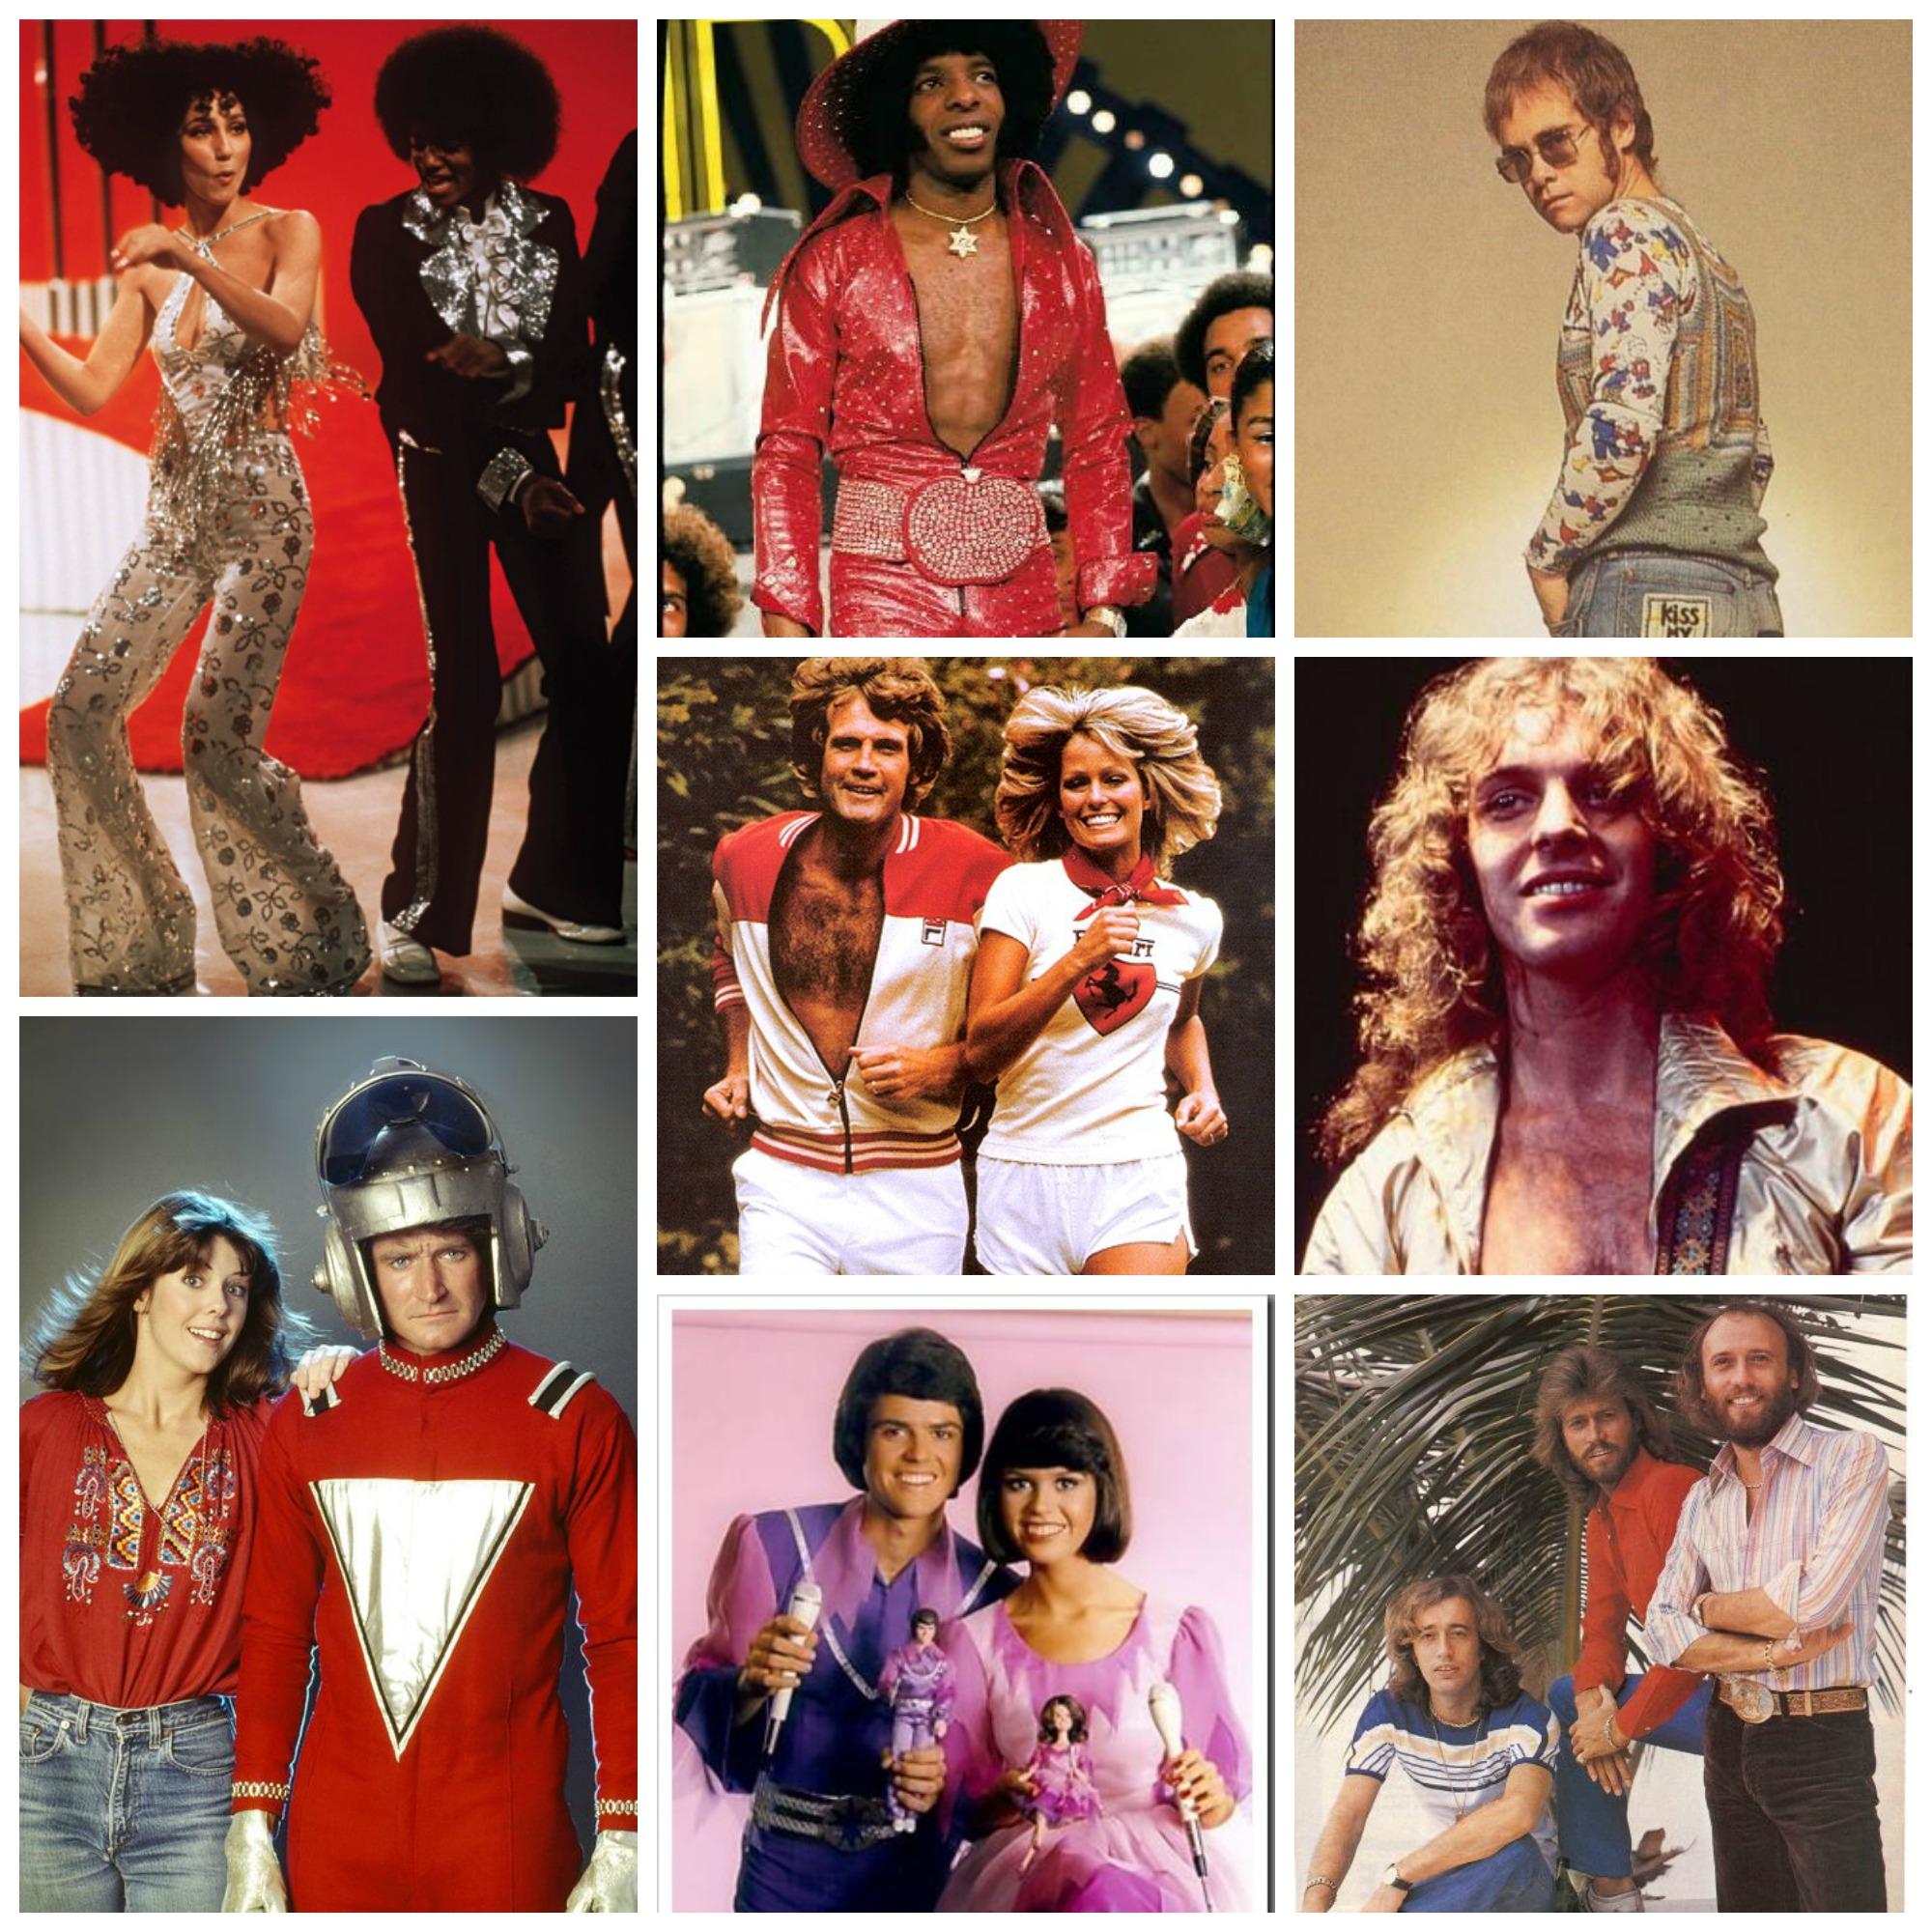 Cher & Michael Jackson, Sly Stone, Elton, Mork & Mindy, Lee Majors